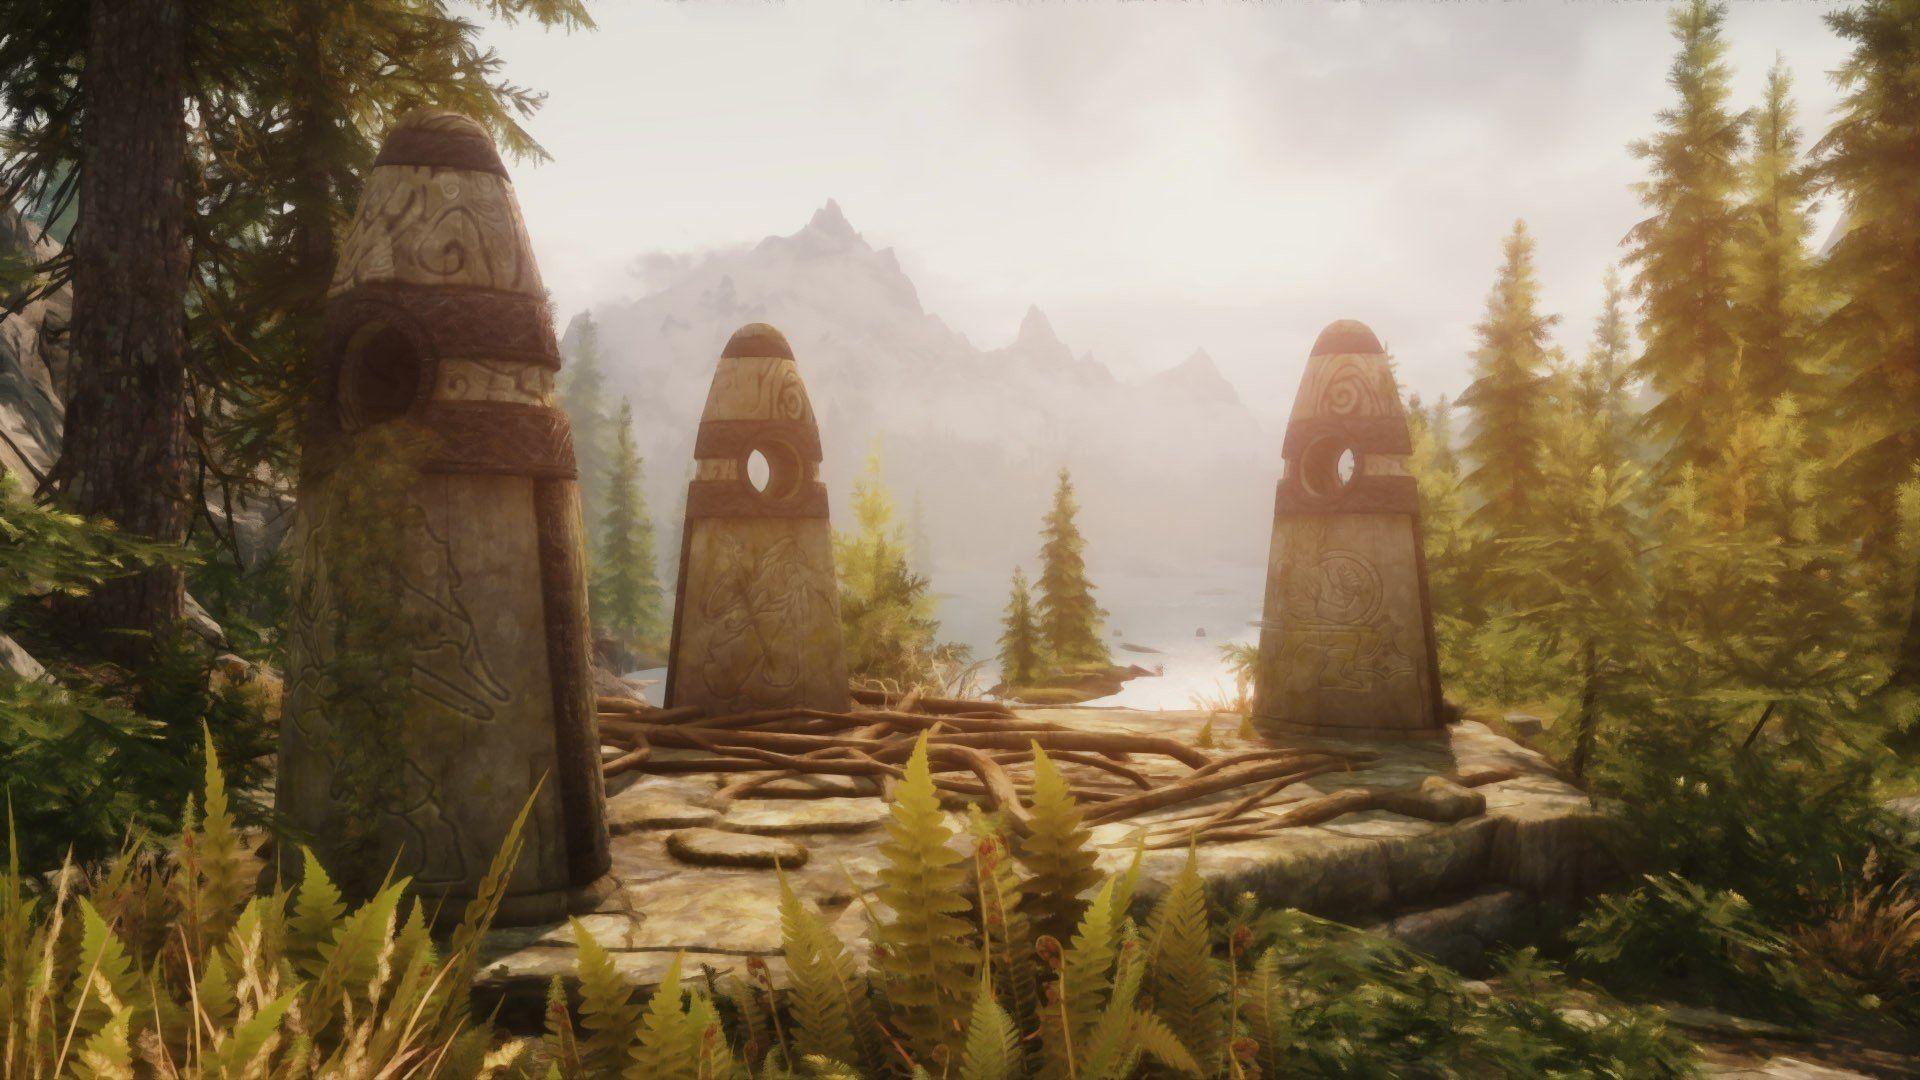 Fantasy Art The Elder Scrolls V Skyrim Wallpaper